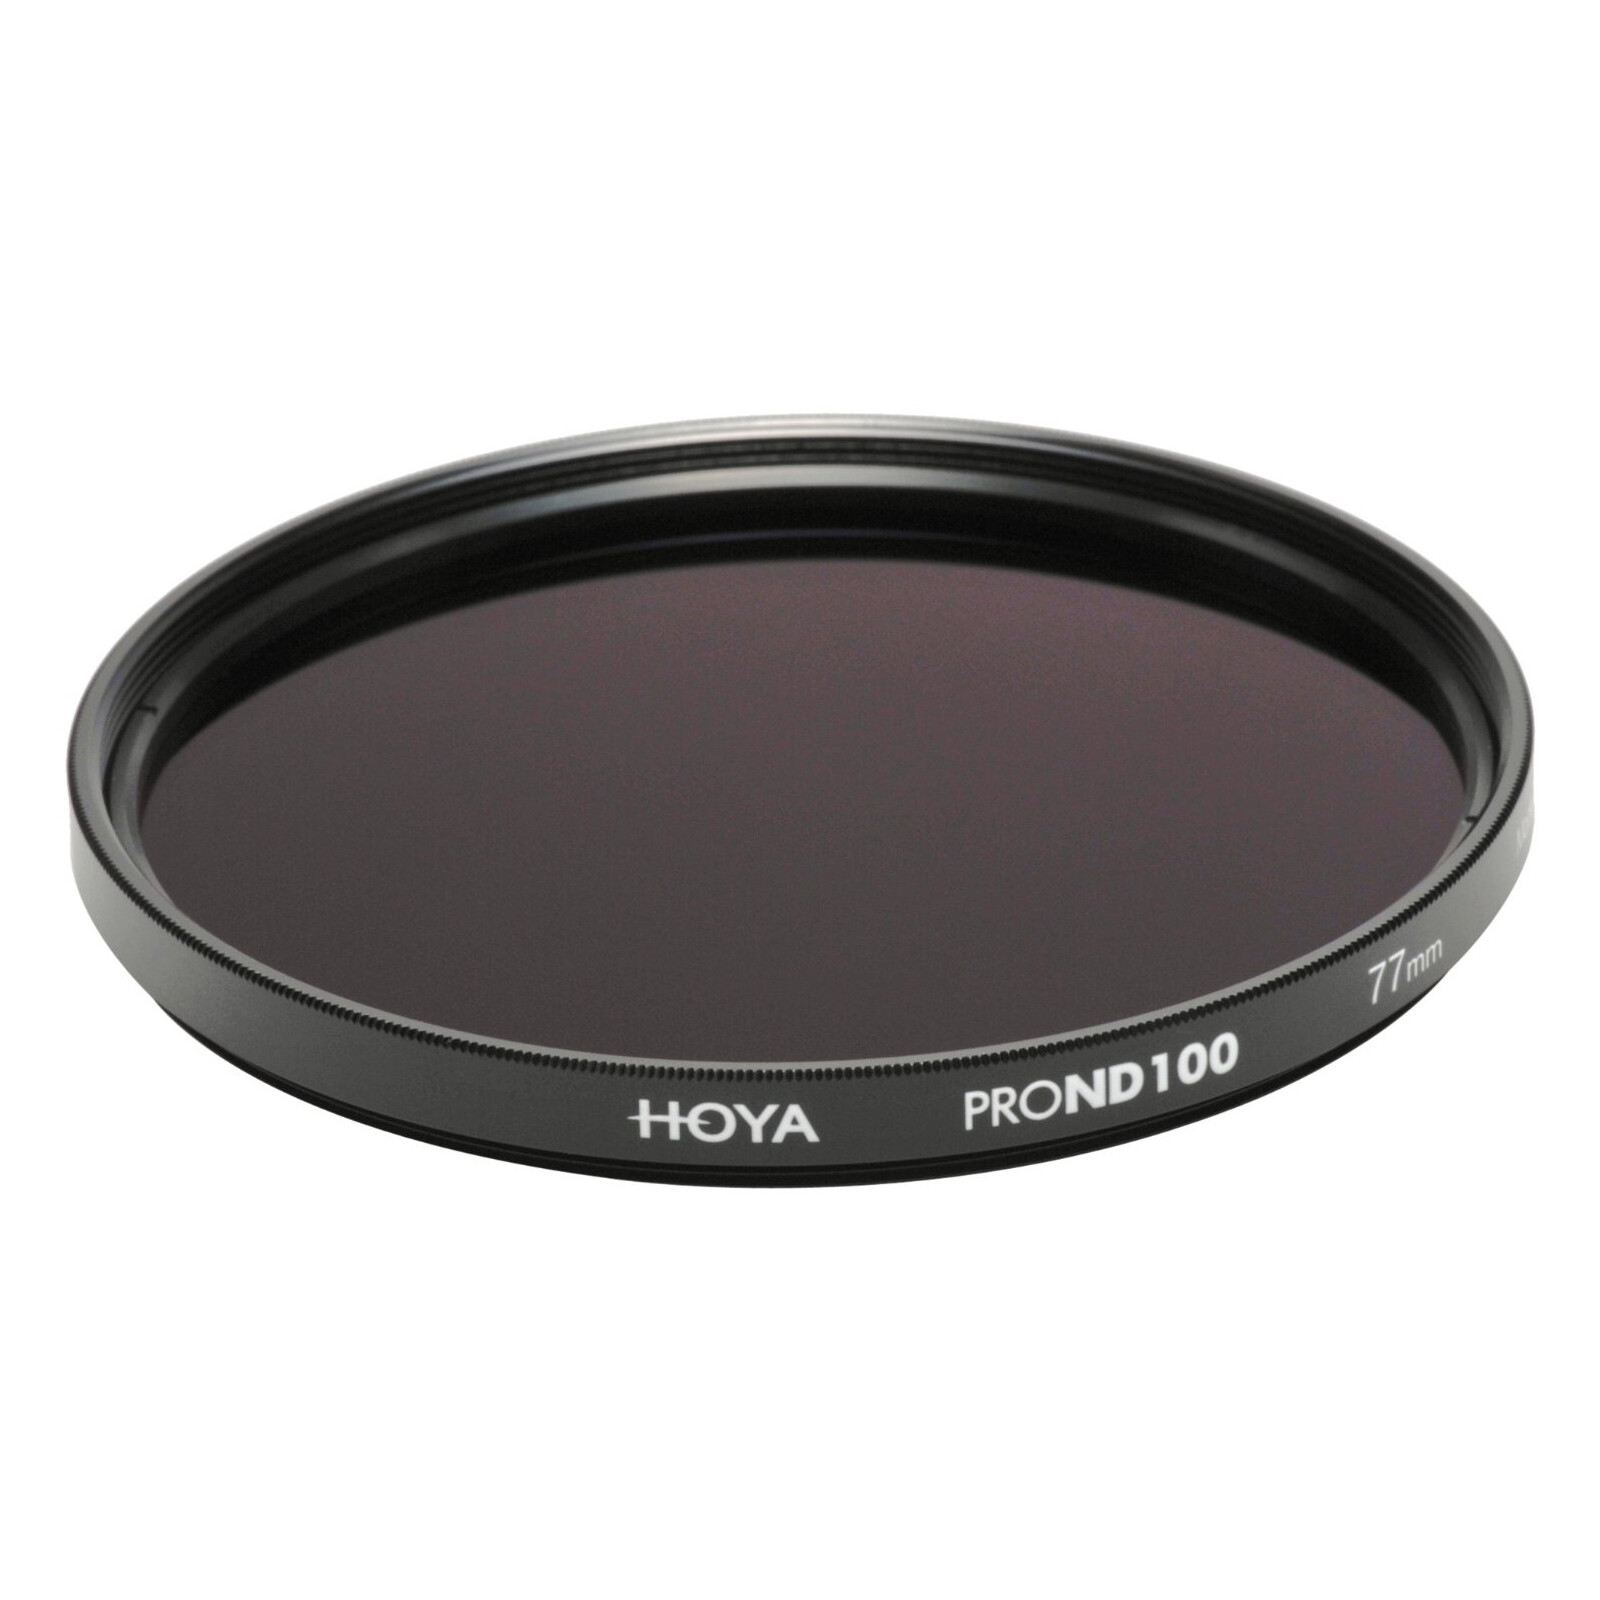 Hoya Grau PRO ND 100 58mm